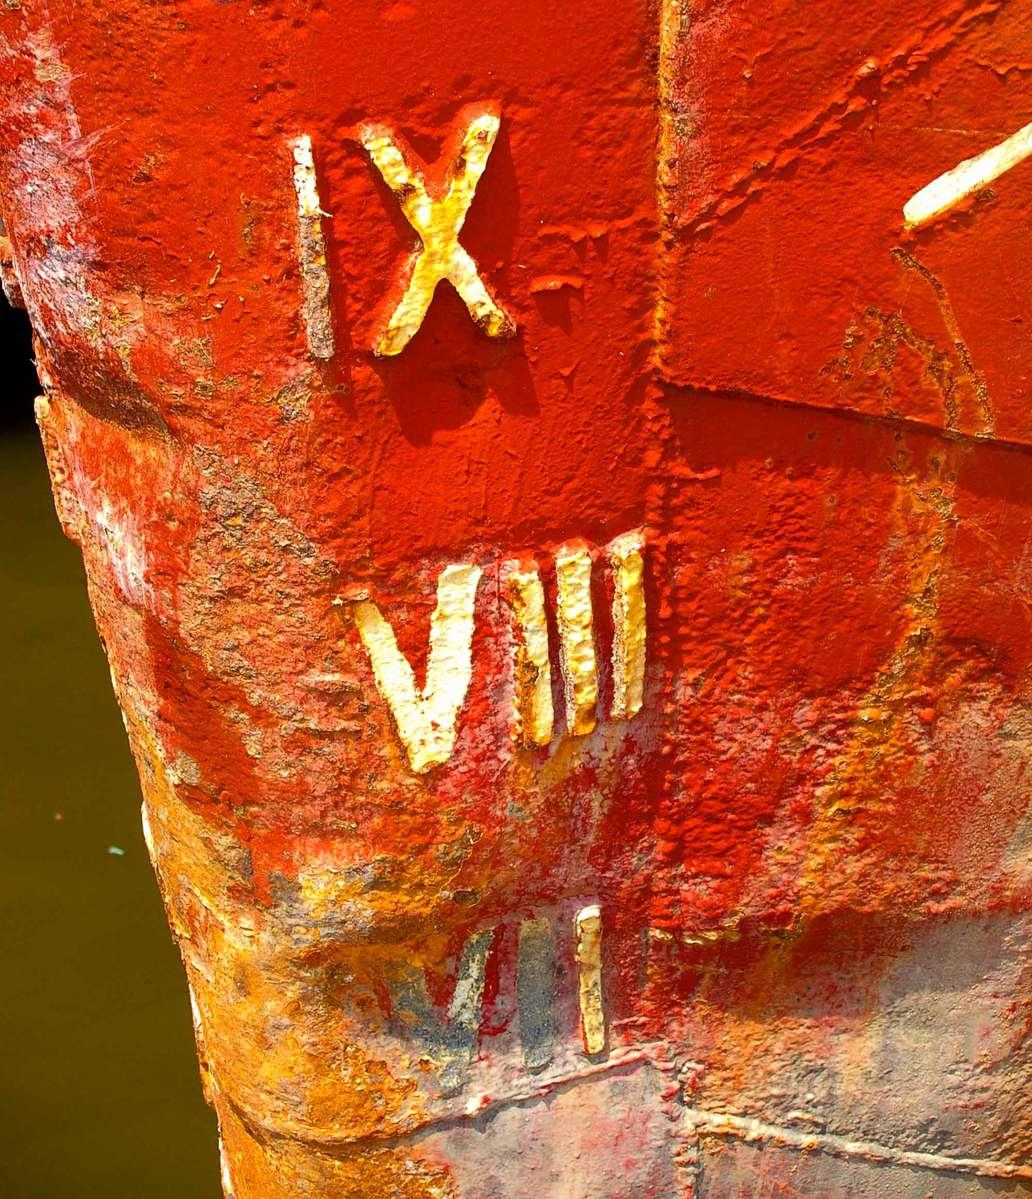 ship-detail-1191125